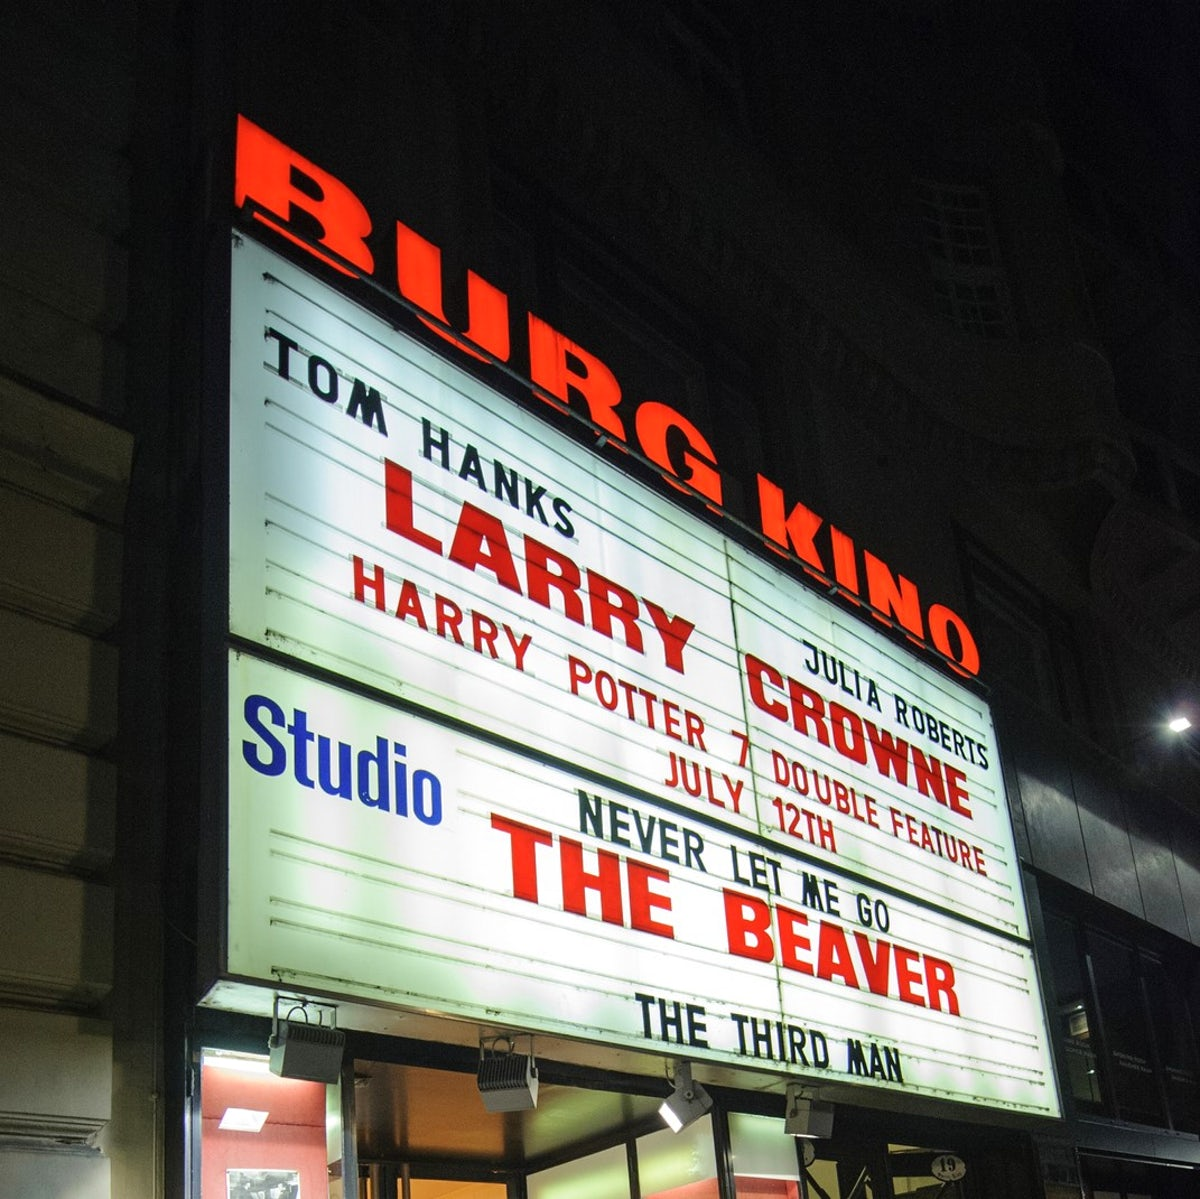 Cinemas with original version films in Vienna